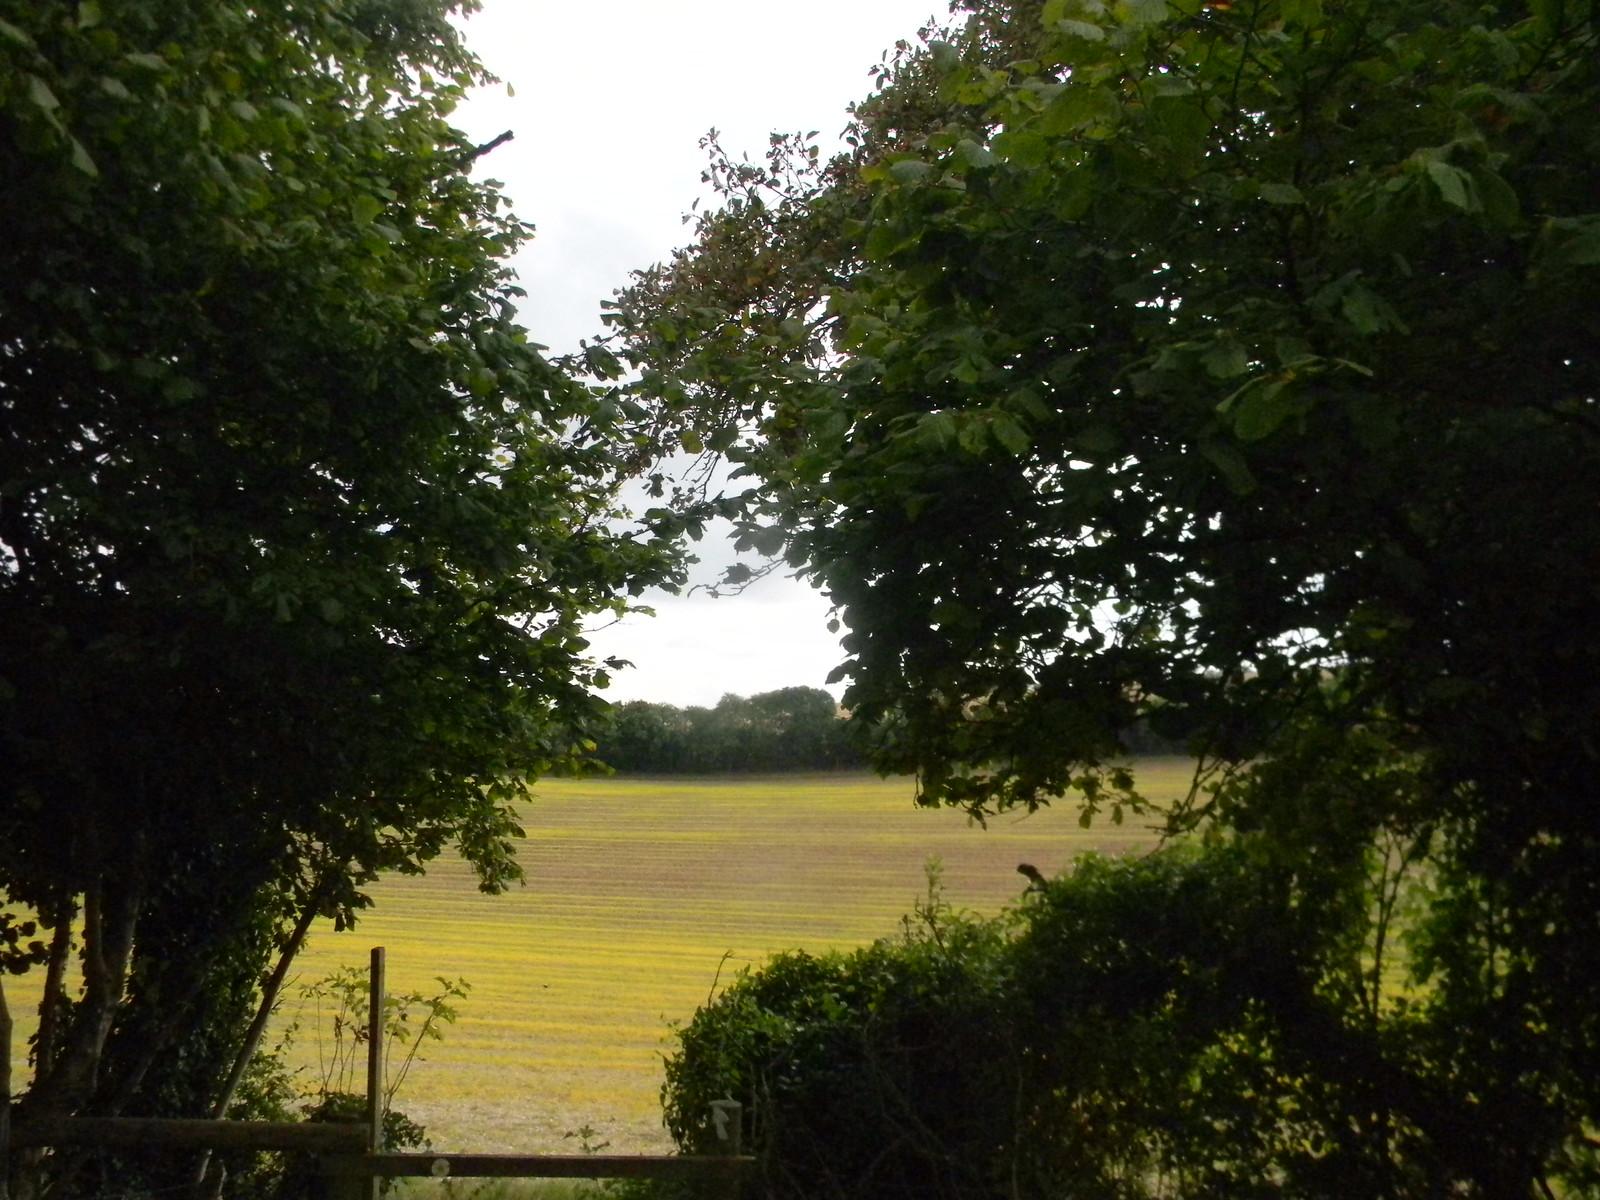 Stripey field - aproaching Radnage Saunderton via Bledlow